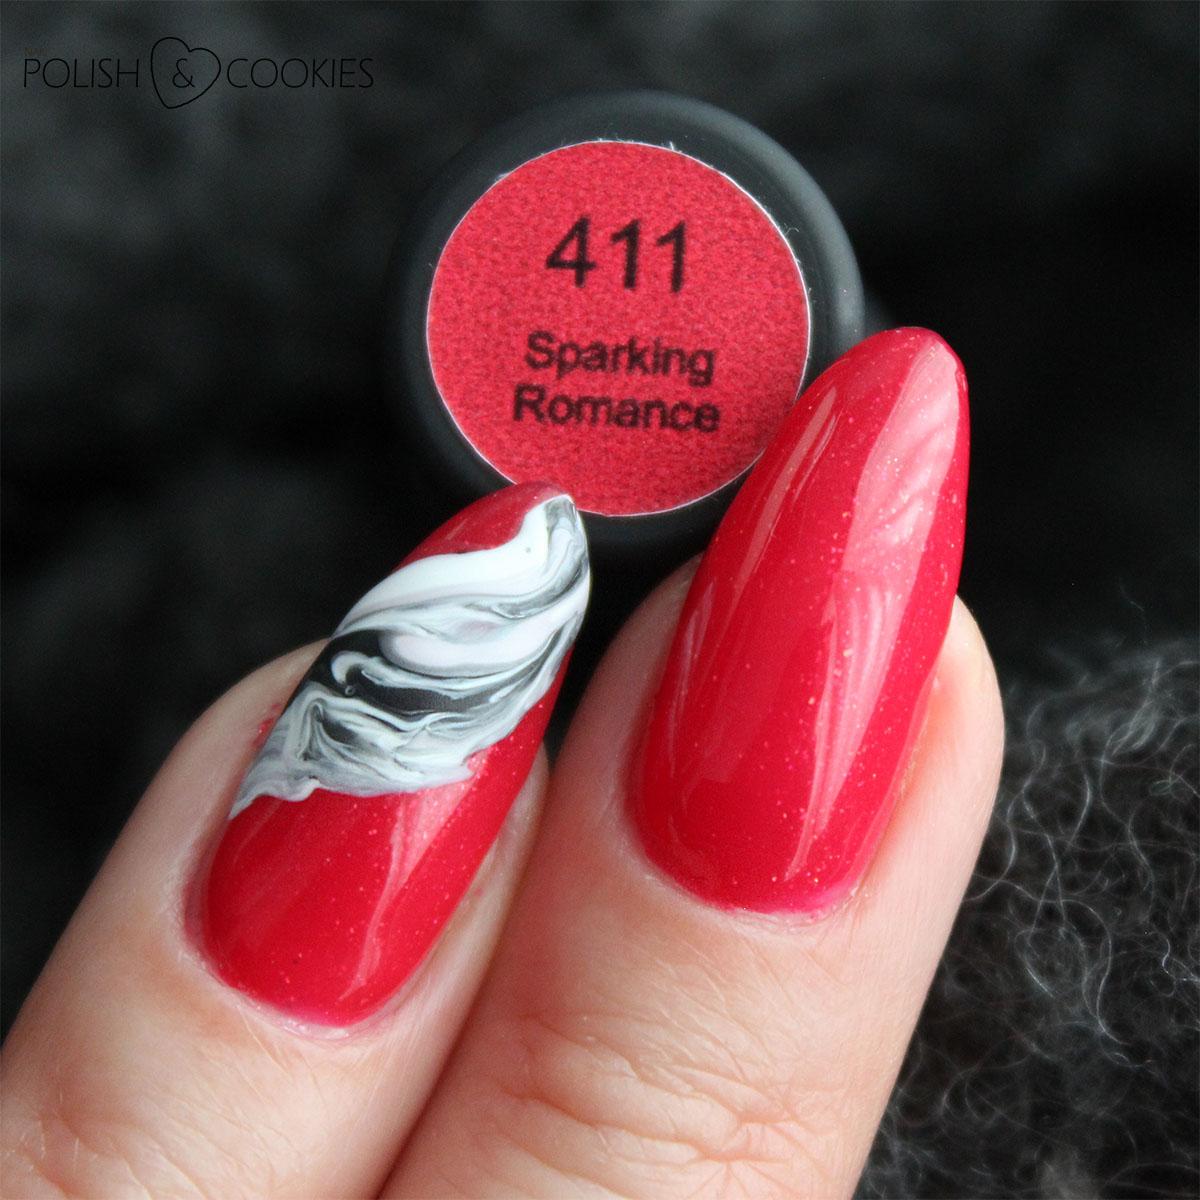 maga 411 sparking romance swatch